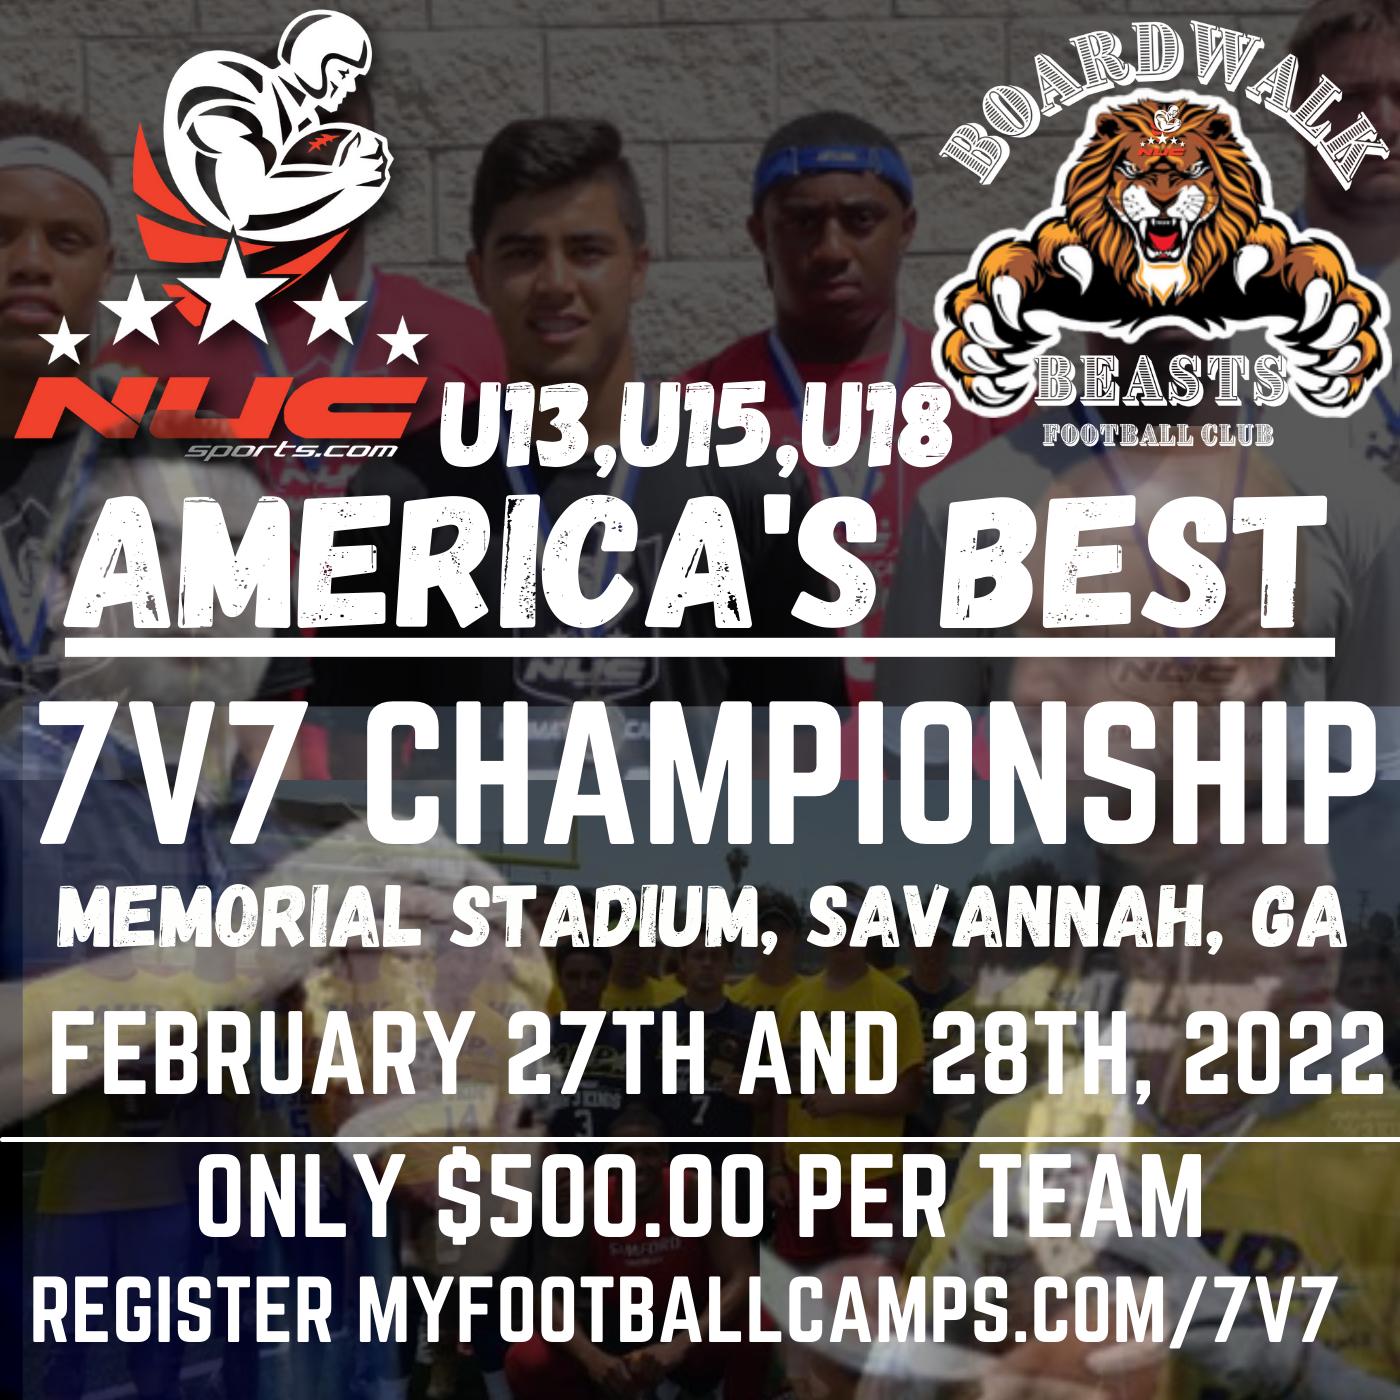 America's Best Elite 7v7 Tournament for U13,U15,U18 Memorial Stadium, Savannah, GA February 27th & 28th, 2022